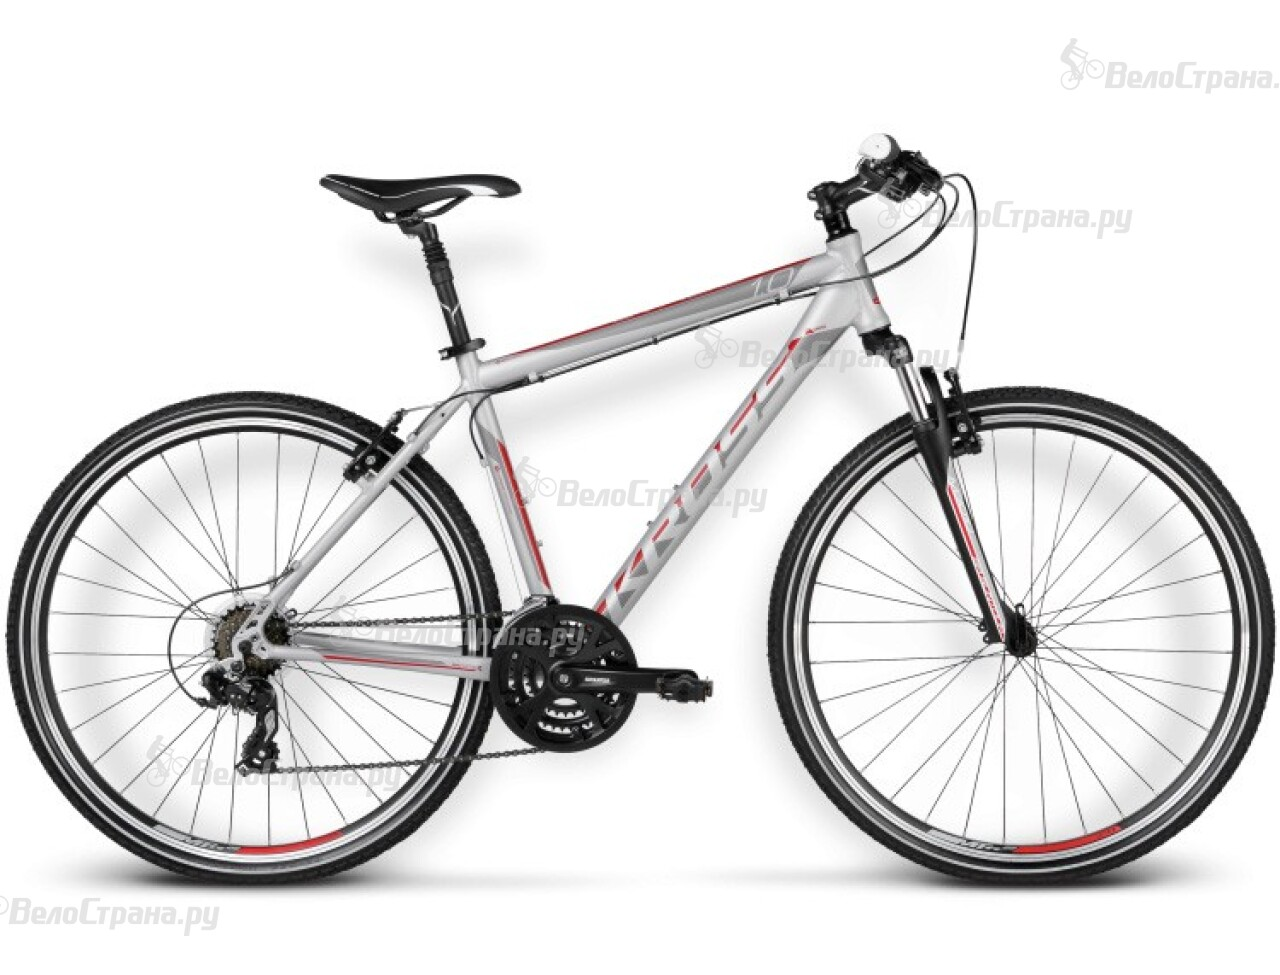 Велосипед Kross EVADO 1.0 (2016) велосипед kross evado 6 0 2016